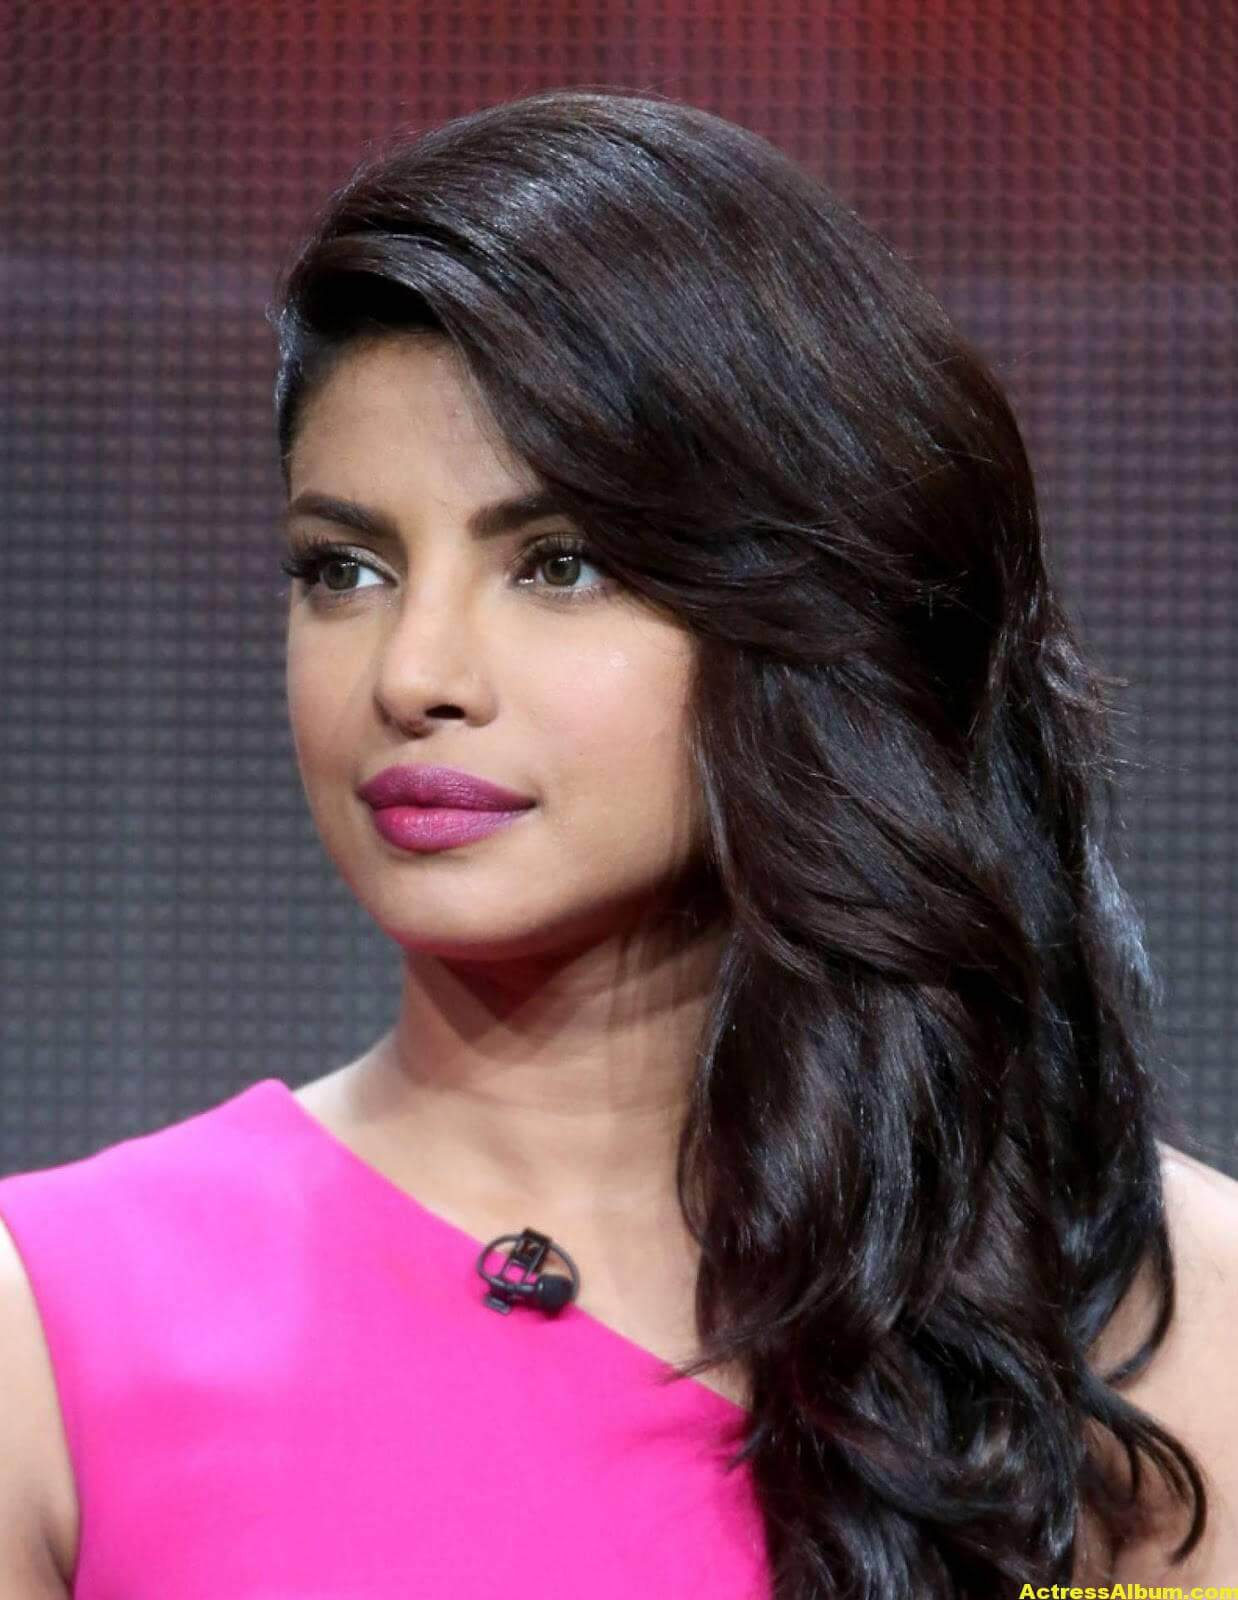 Priyanka Chopra Latest Pictures in Pink Dress